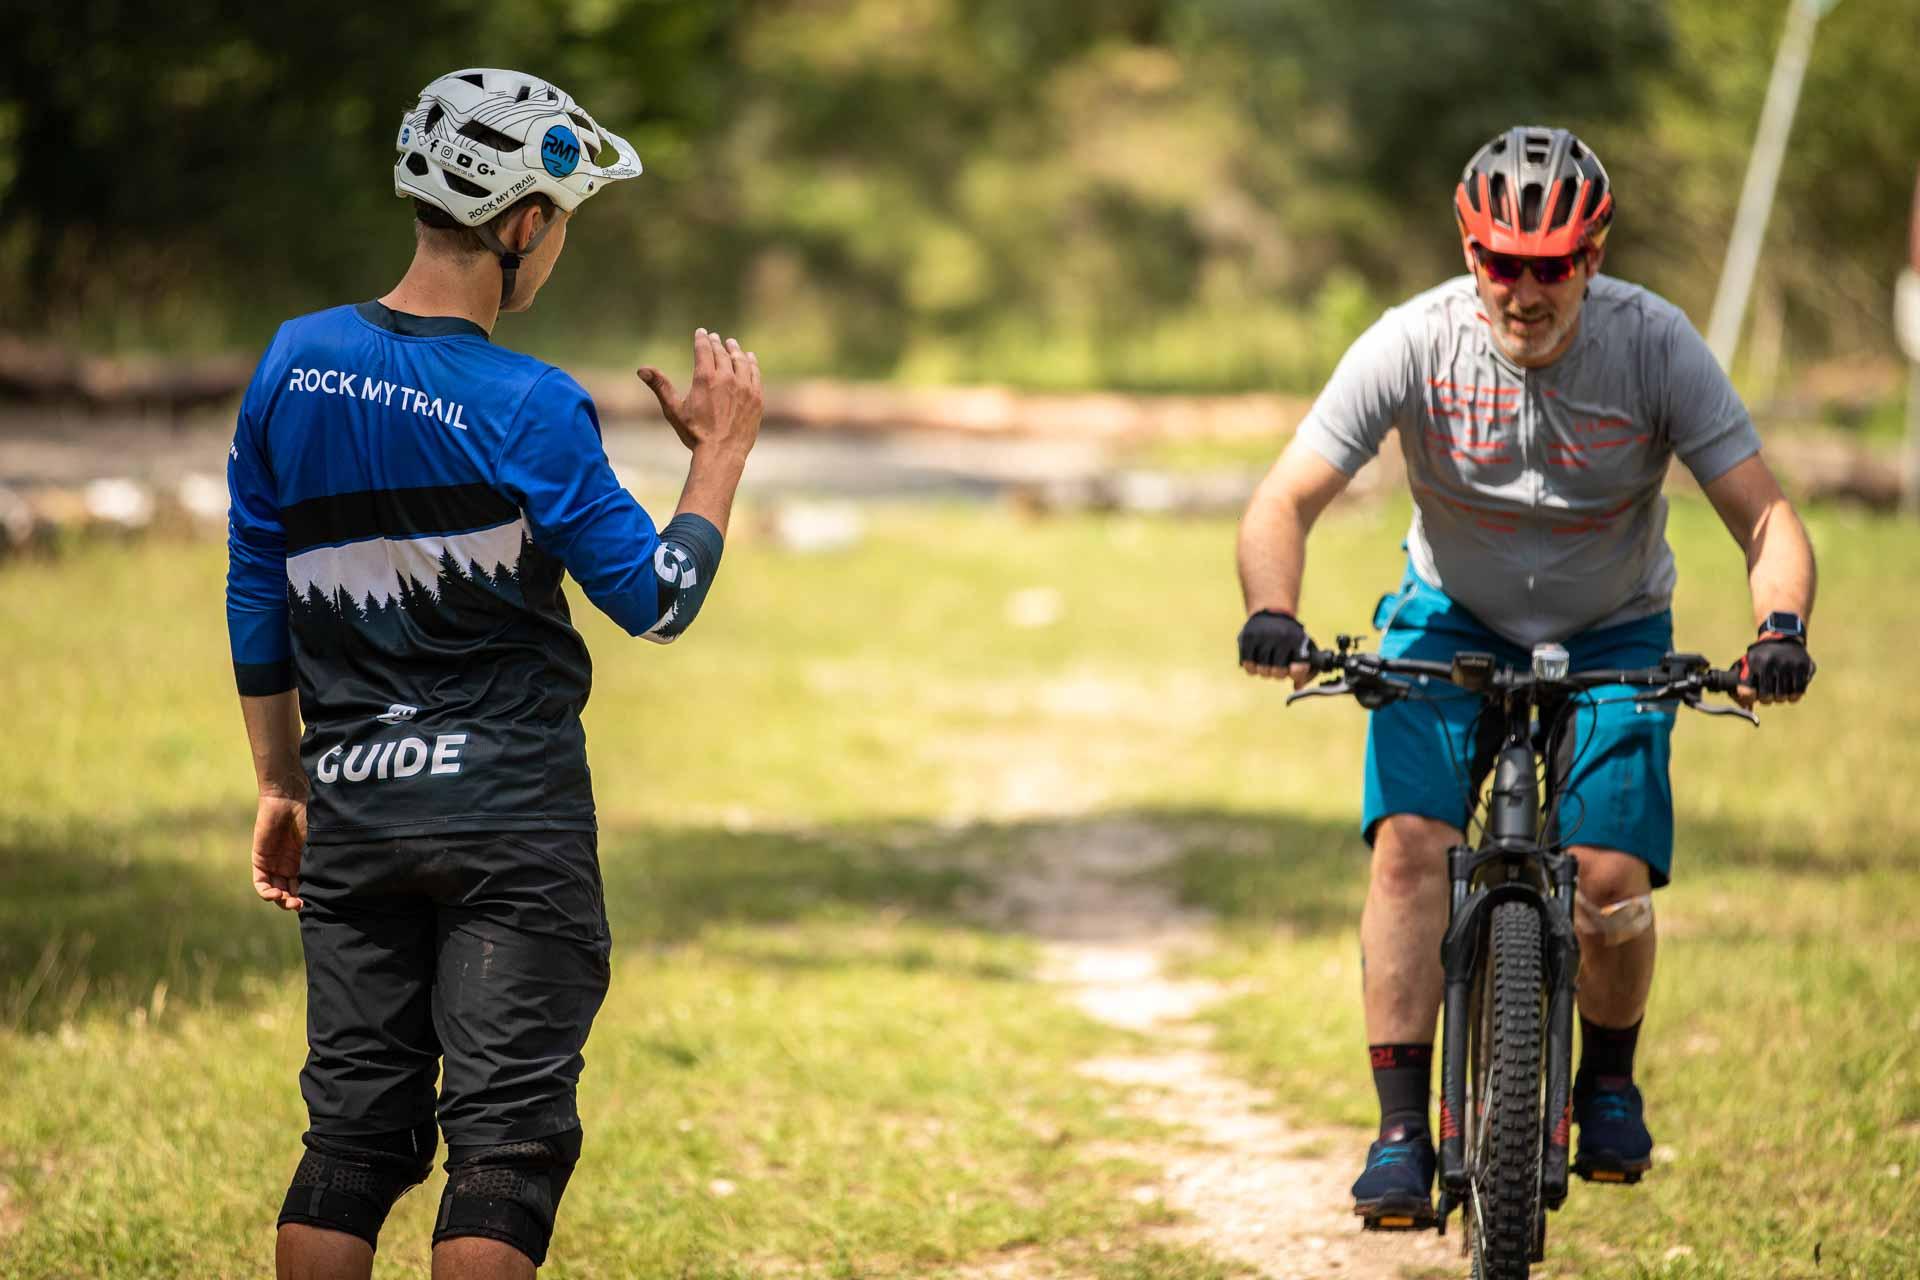 eMTB eBike Fortgeschritten Fahrtechnik Kurs in Siegen - Rock my Trail Bikeschule319